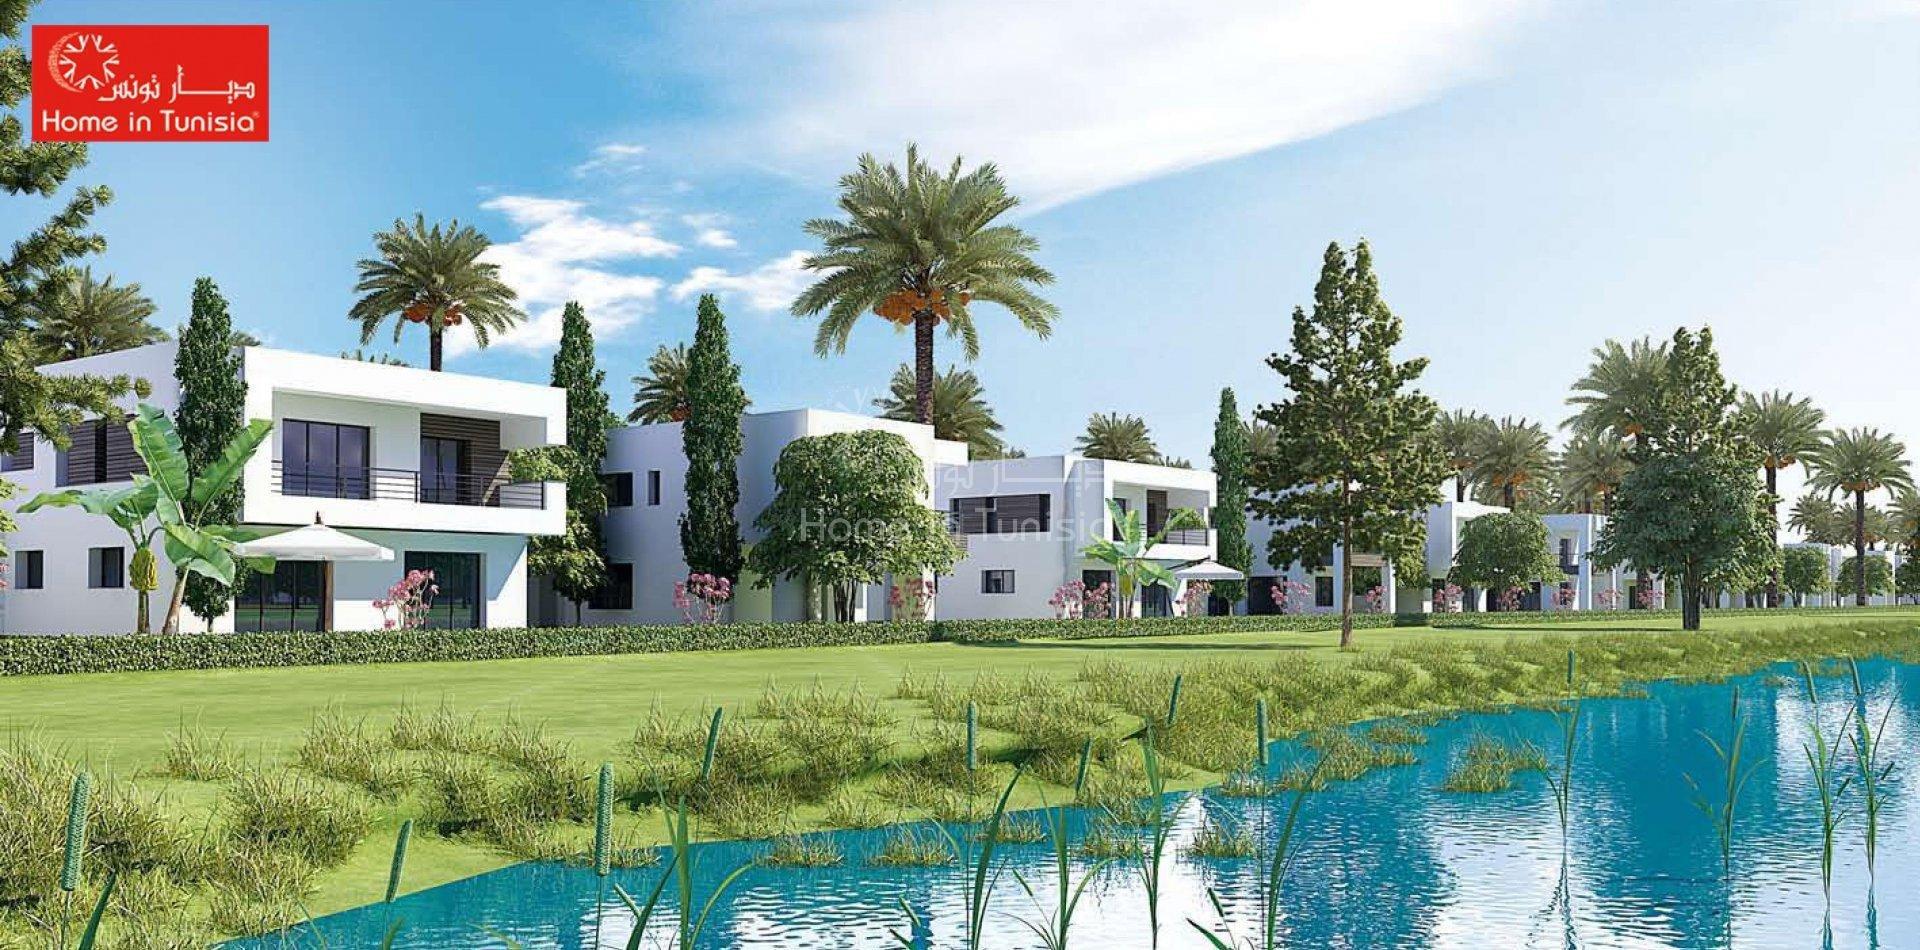 Tunis Bay résidentiel golf villa Oceanos jumelée 4 chambres terrasse jardin piscine privee